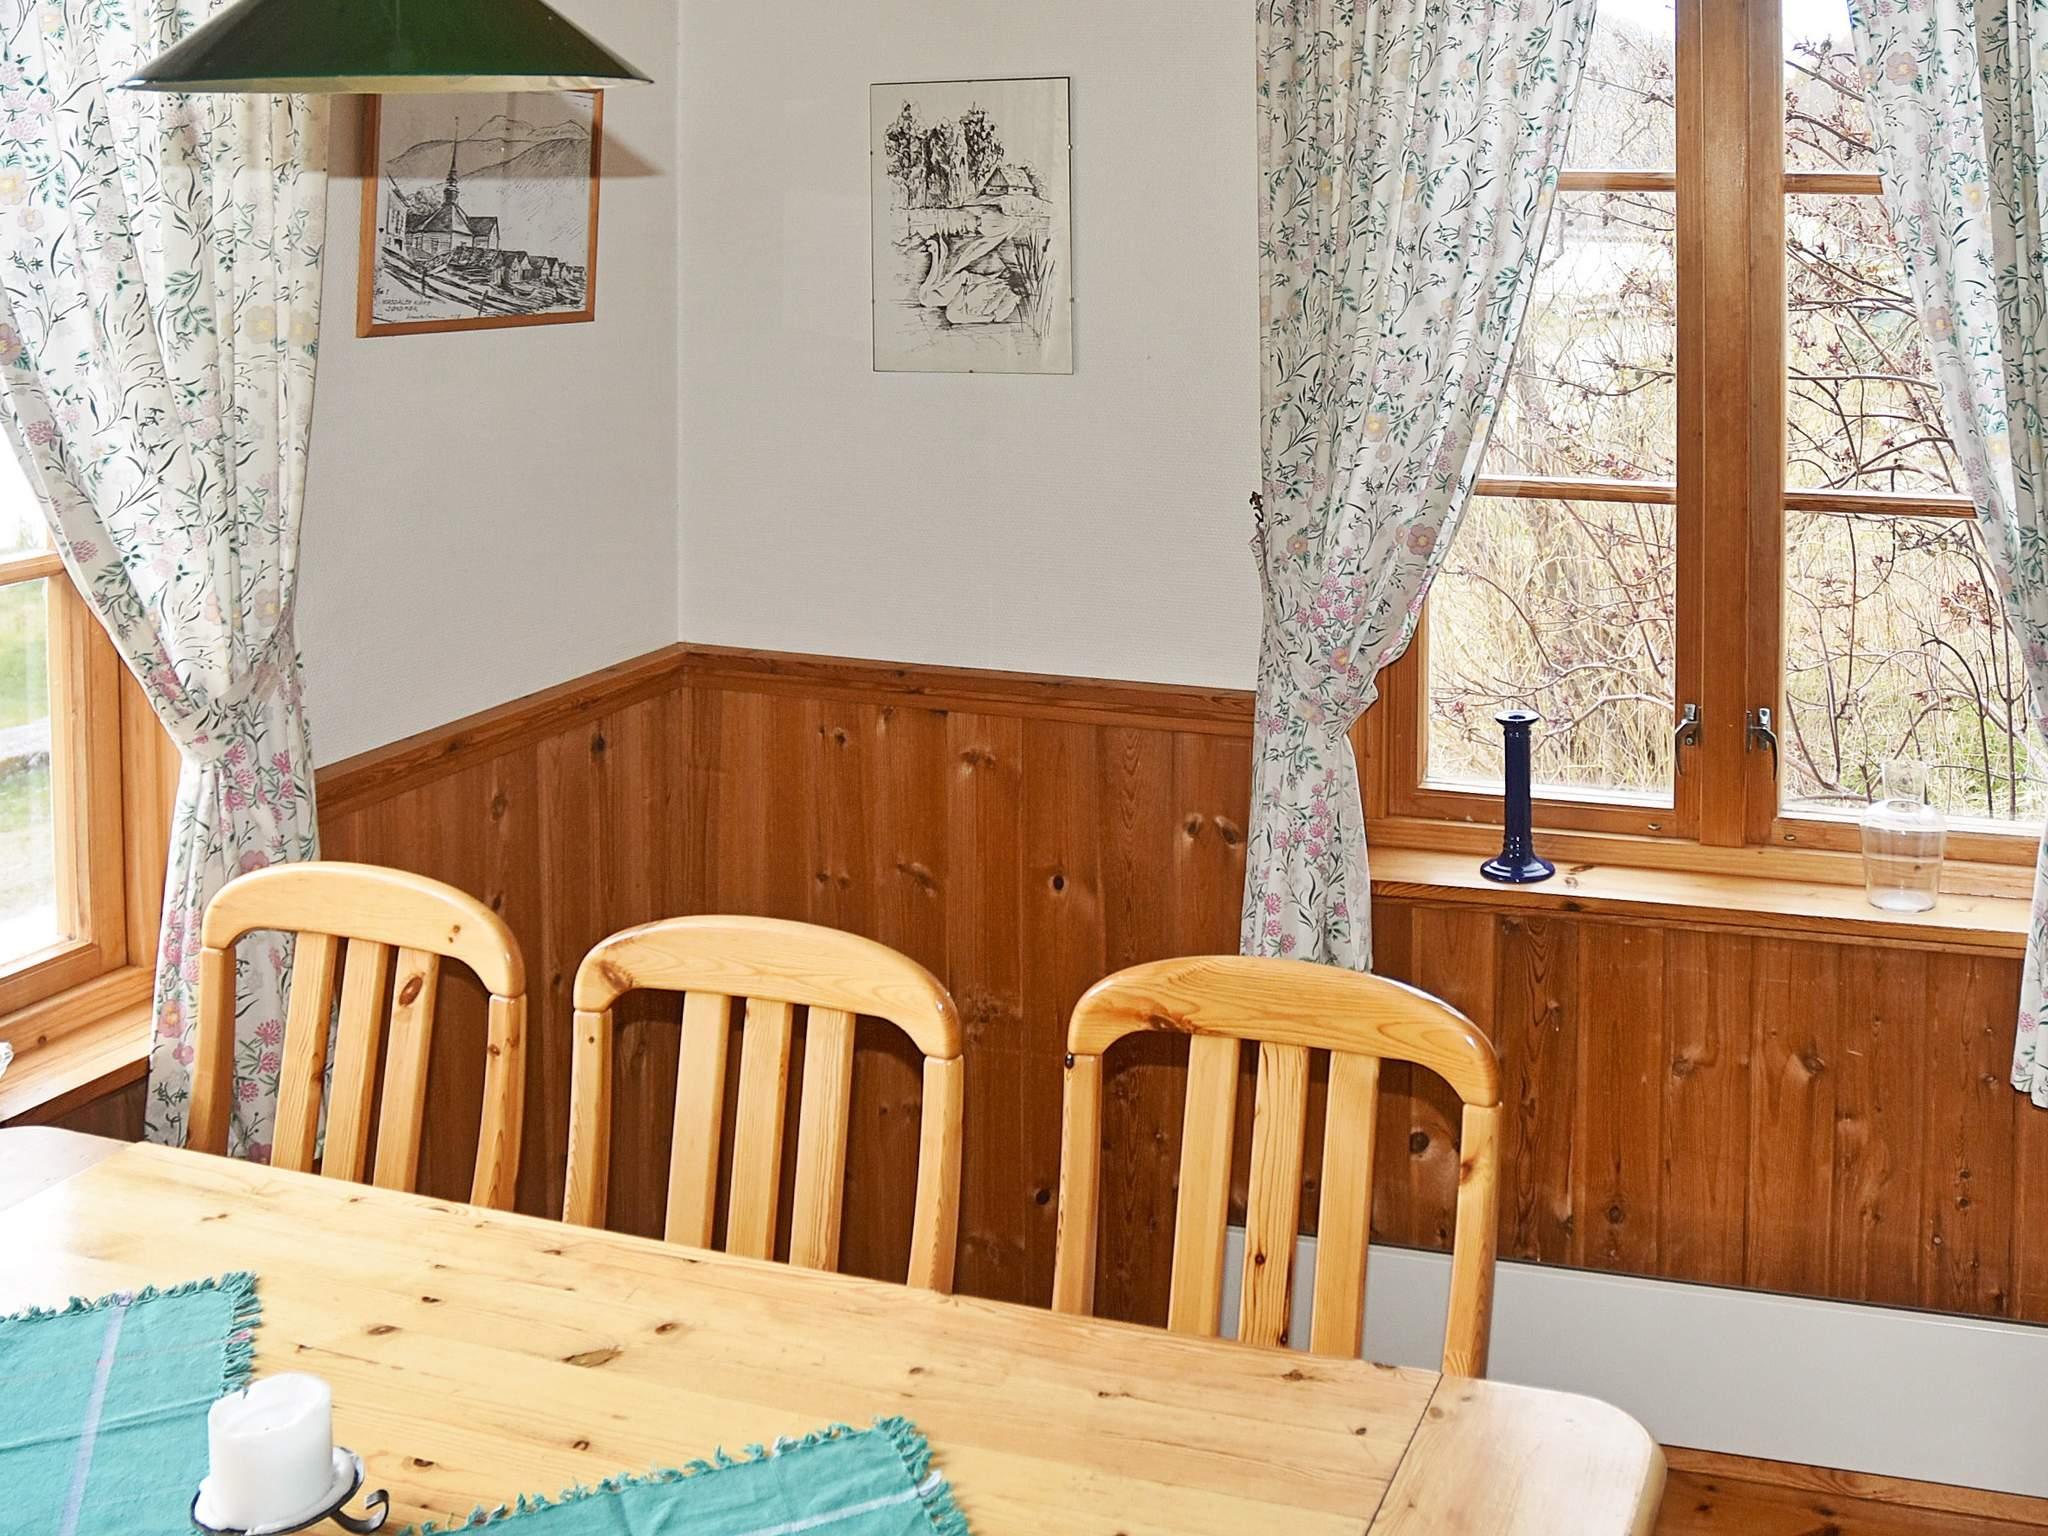 Ferienhaus Norddal (85061), Norddal, More - Romsdal, Westnorwegen, Norwegen, Bild 8